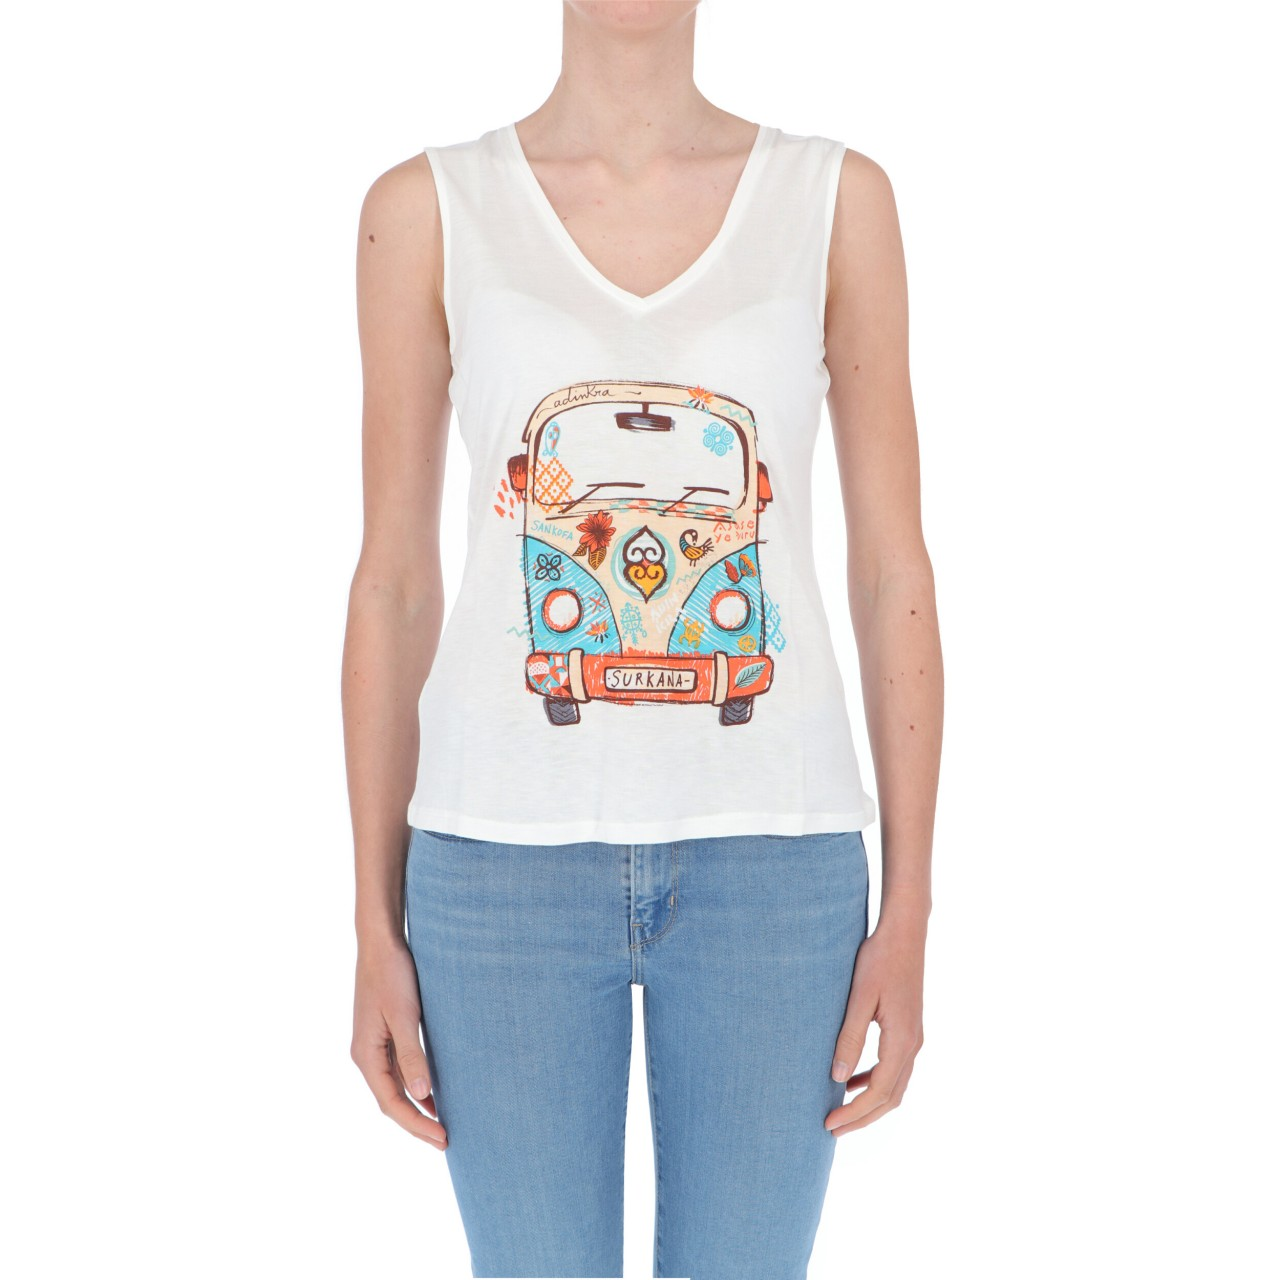 Surkana T-shirt Surkana Donna Stampa Fantasia POKK013P